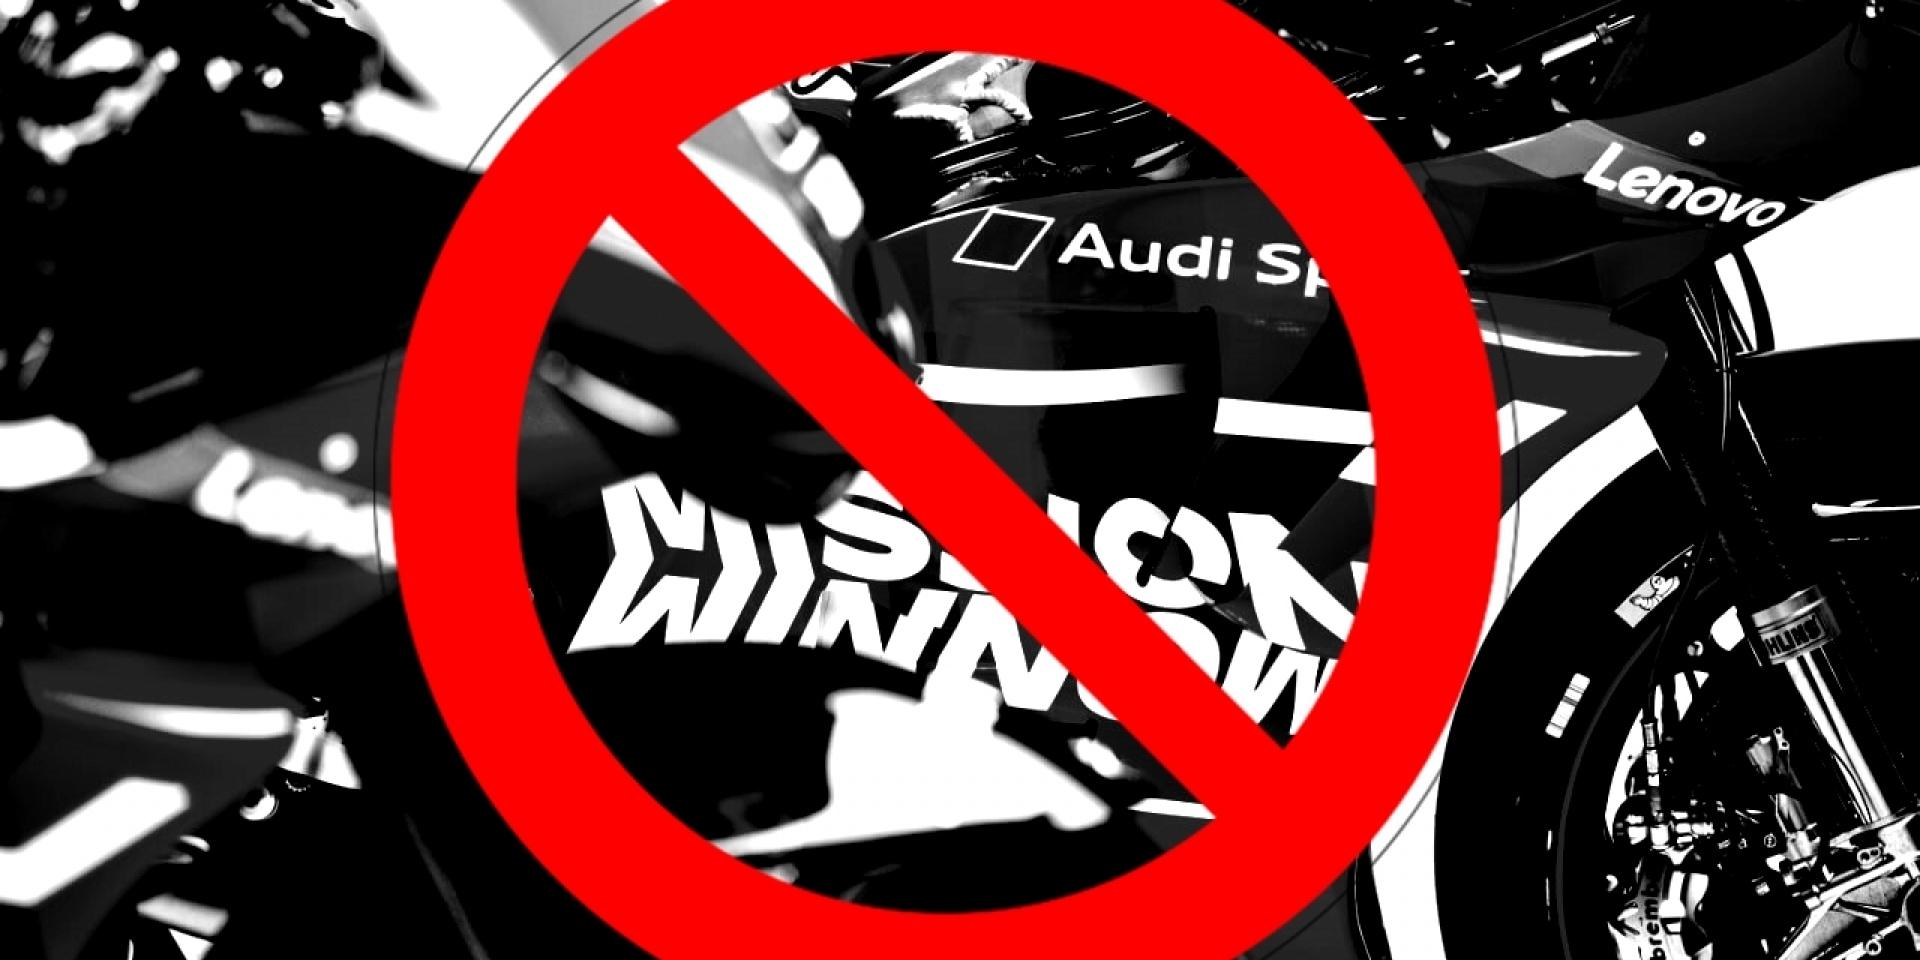 TC的編輯視角│進行一個遮蔽的動作。Mission Winnow的爭議與賽車菸商禁令